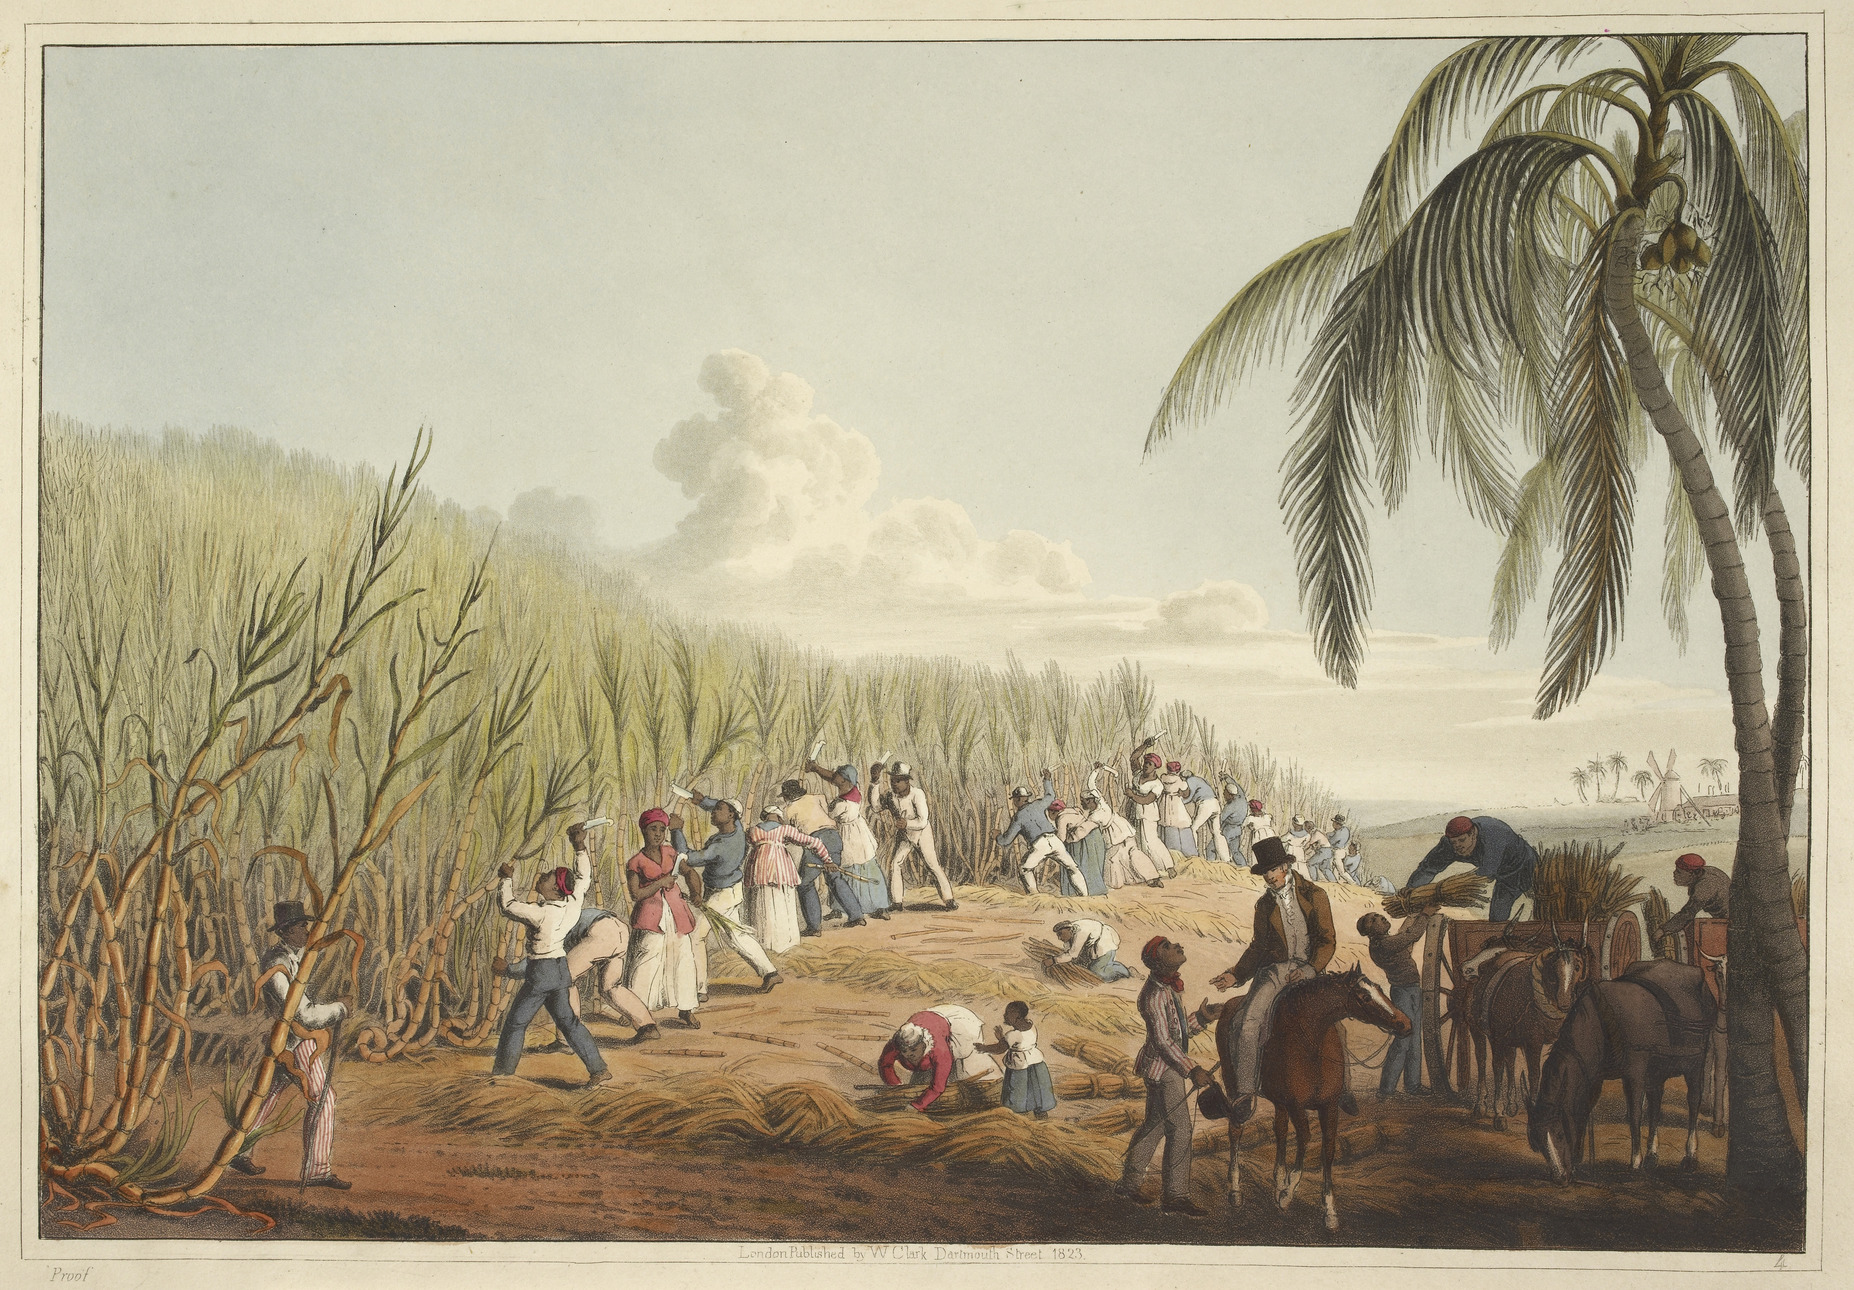 Slaves_cutting_the_sugar_cane_-_Ten_Views_in_the_Island_of_Antigua_(1823),_plate_IV_-_BL